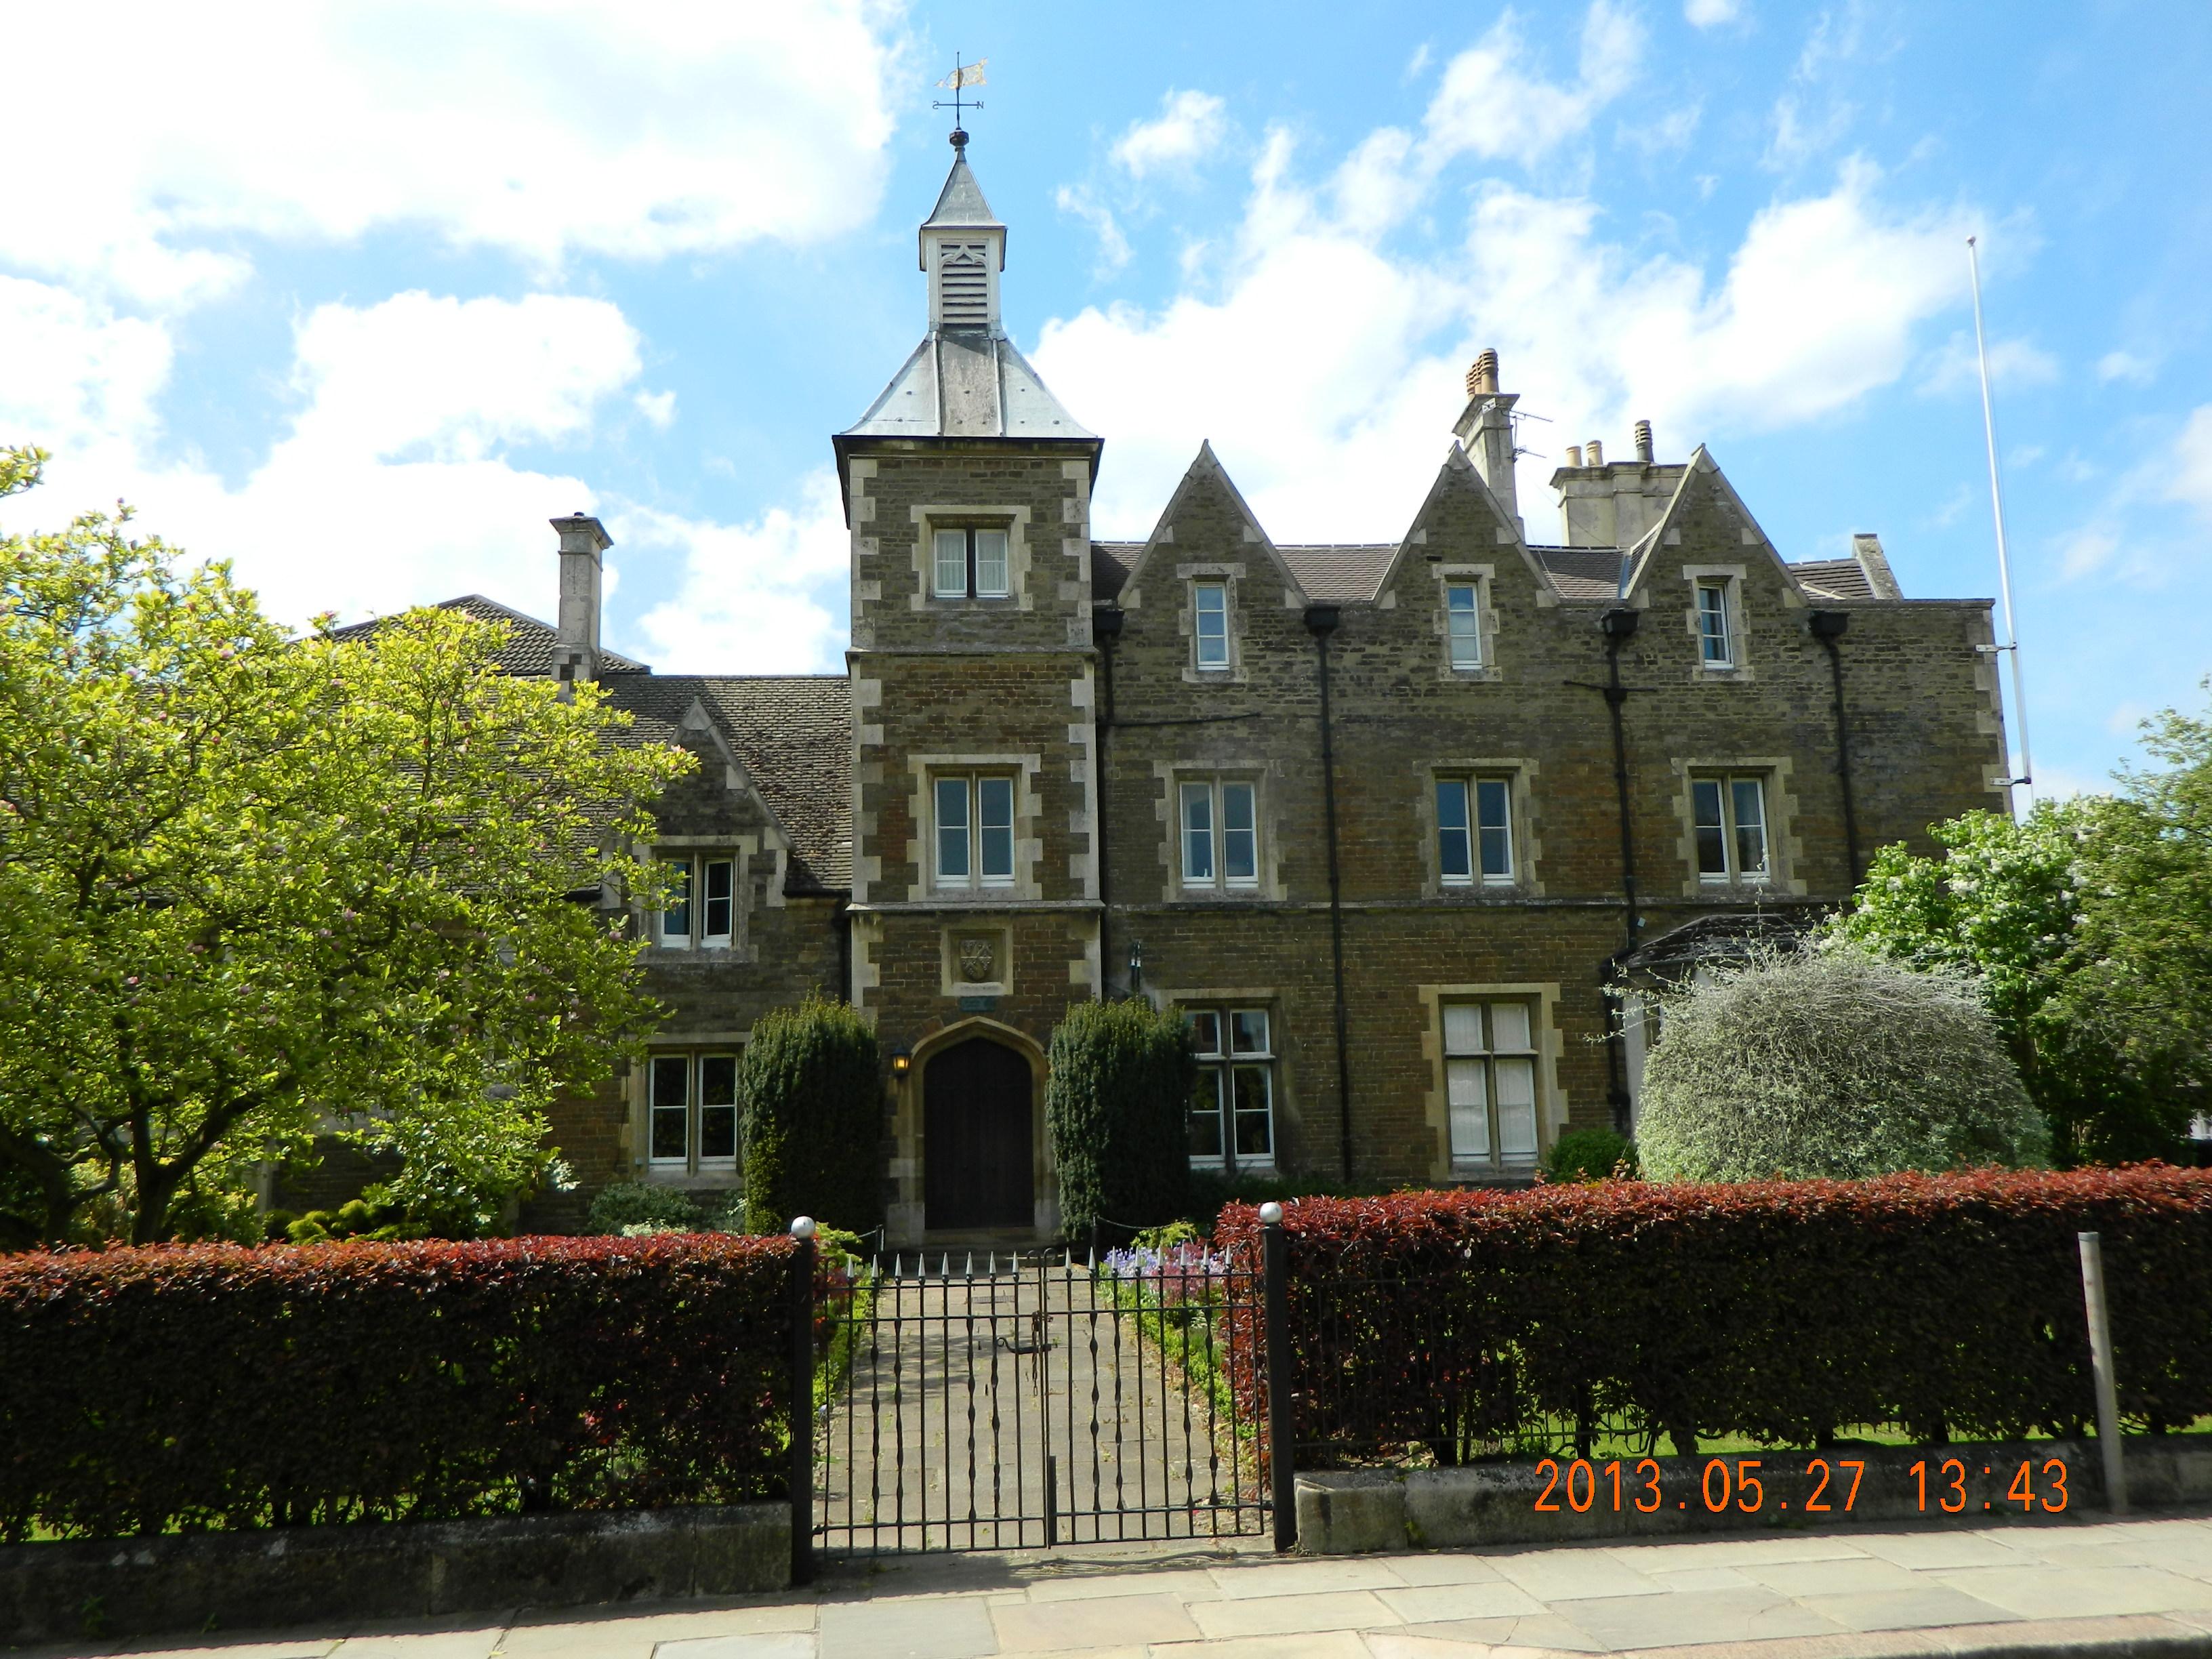 Oakham United Kingdom  city photos gallery : School House, Oakham School Oakham